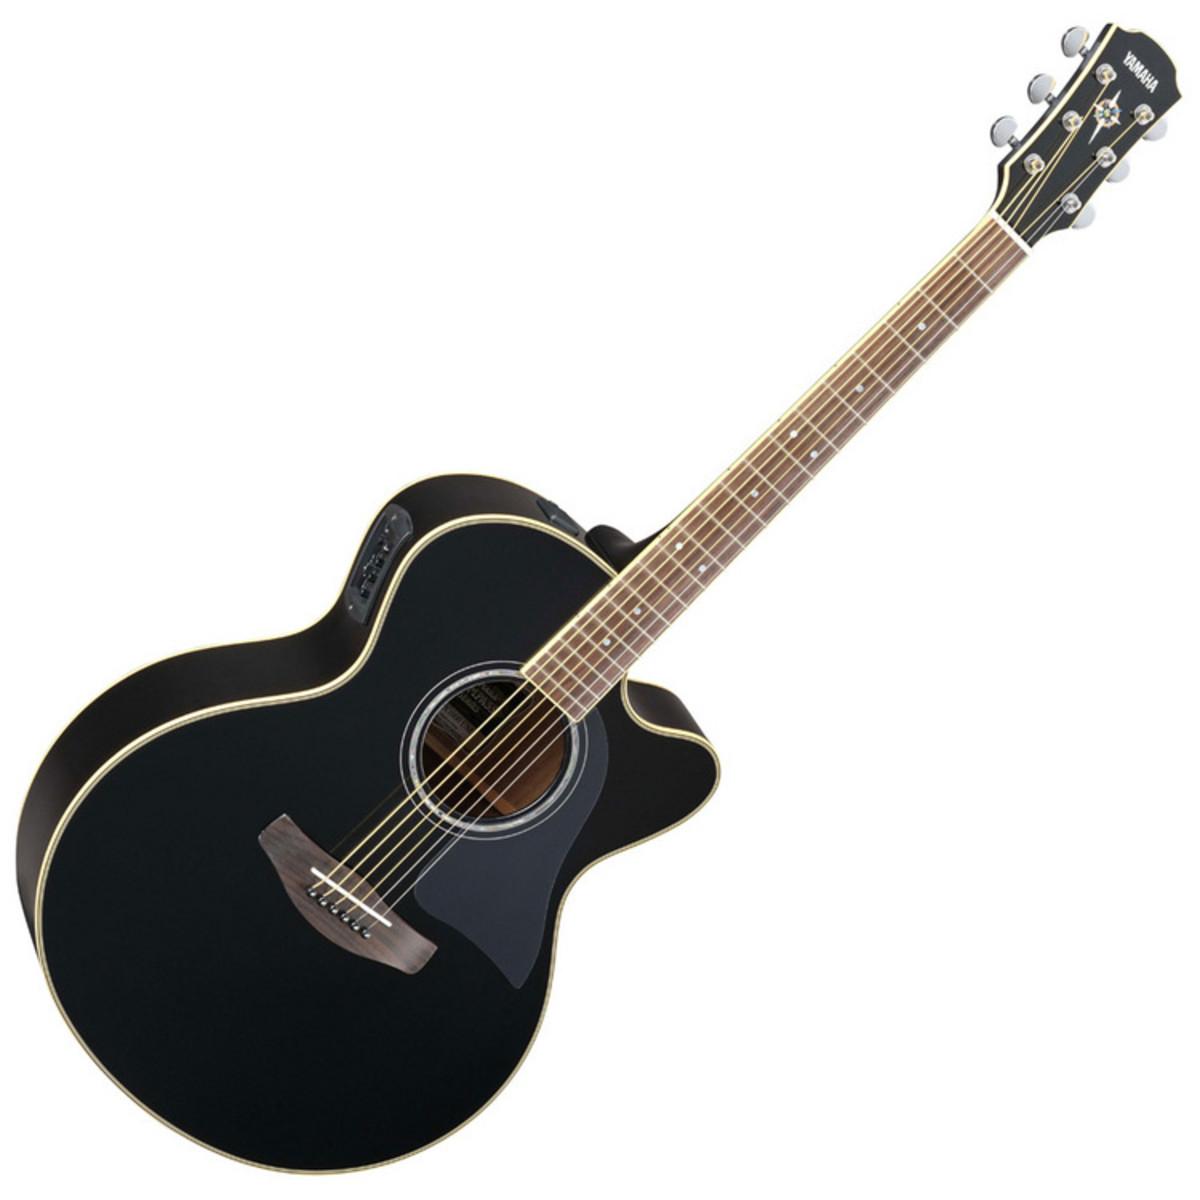 yamaha cpx700ii guitare electro acoustique noir. Black Bedroom Furniture Sets. Home Design Ideas